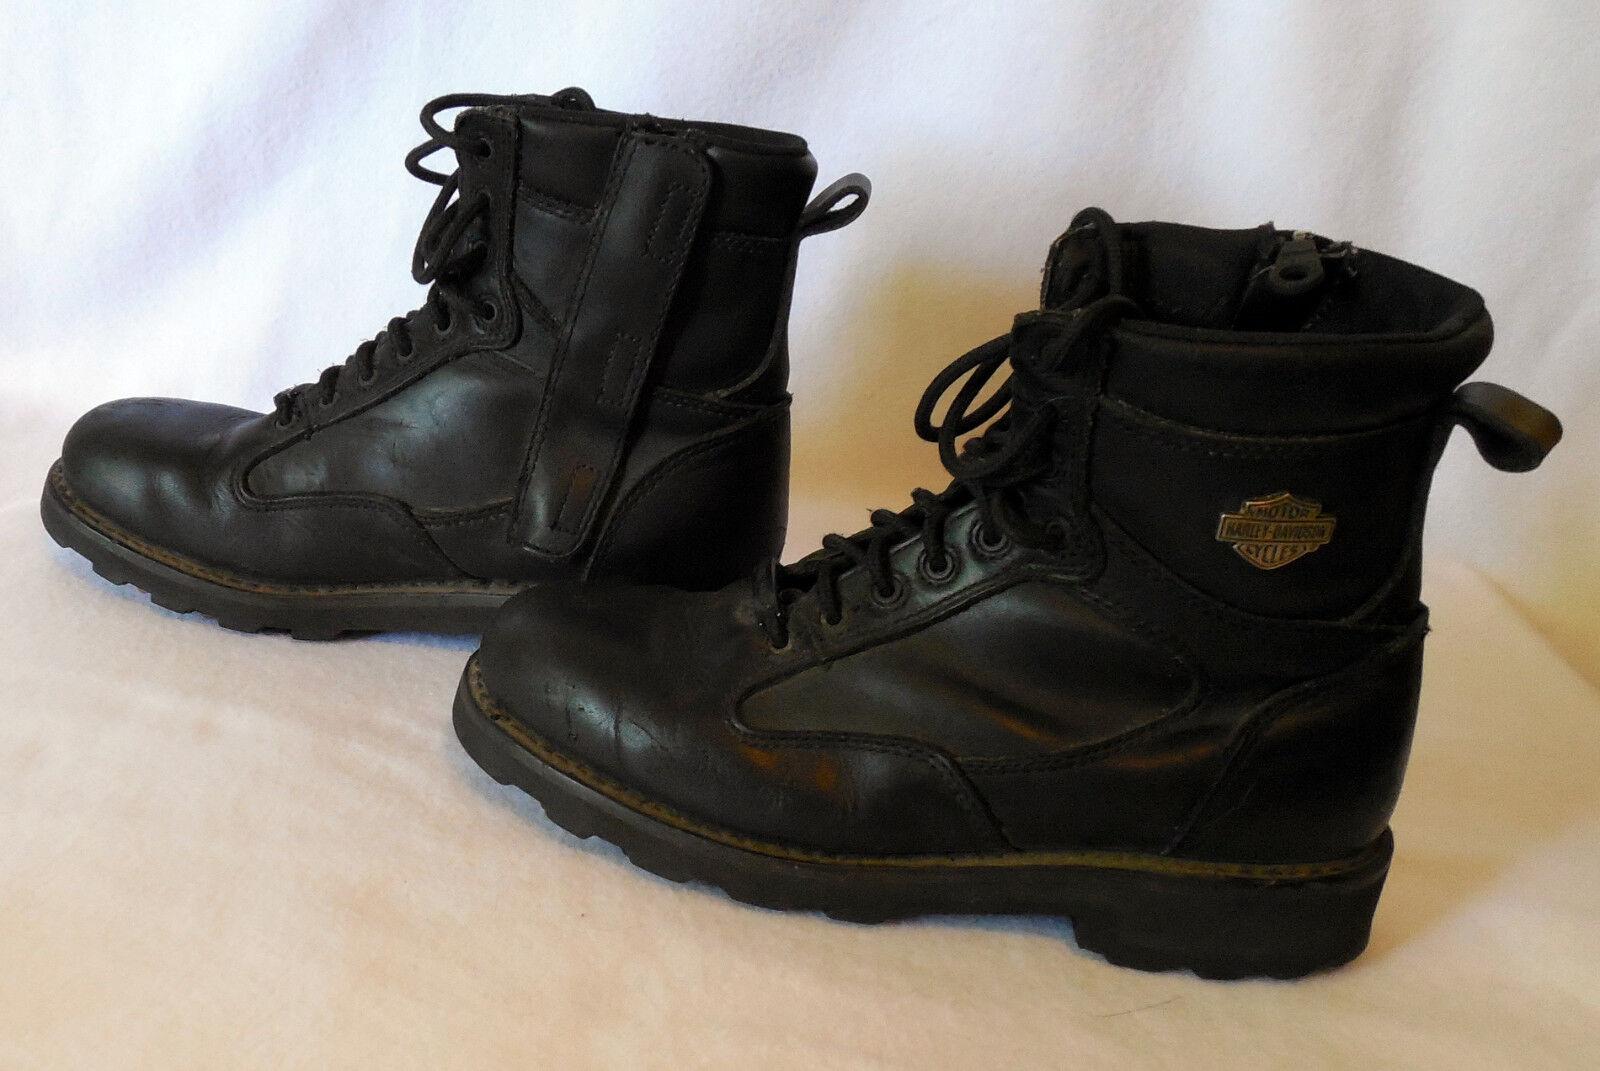 HARLEY DAVIDSON mens BOOTS SHOES size 9.5  G189